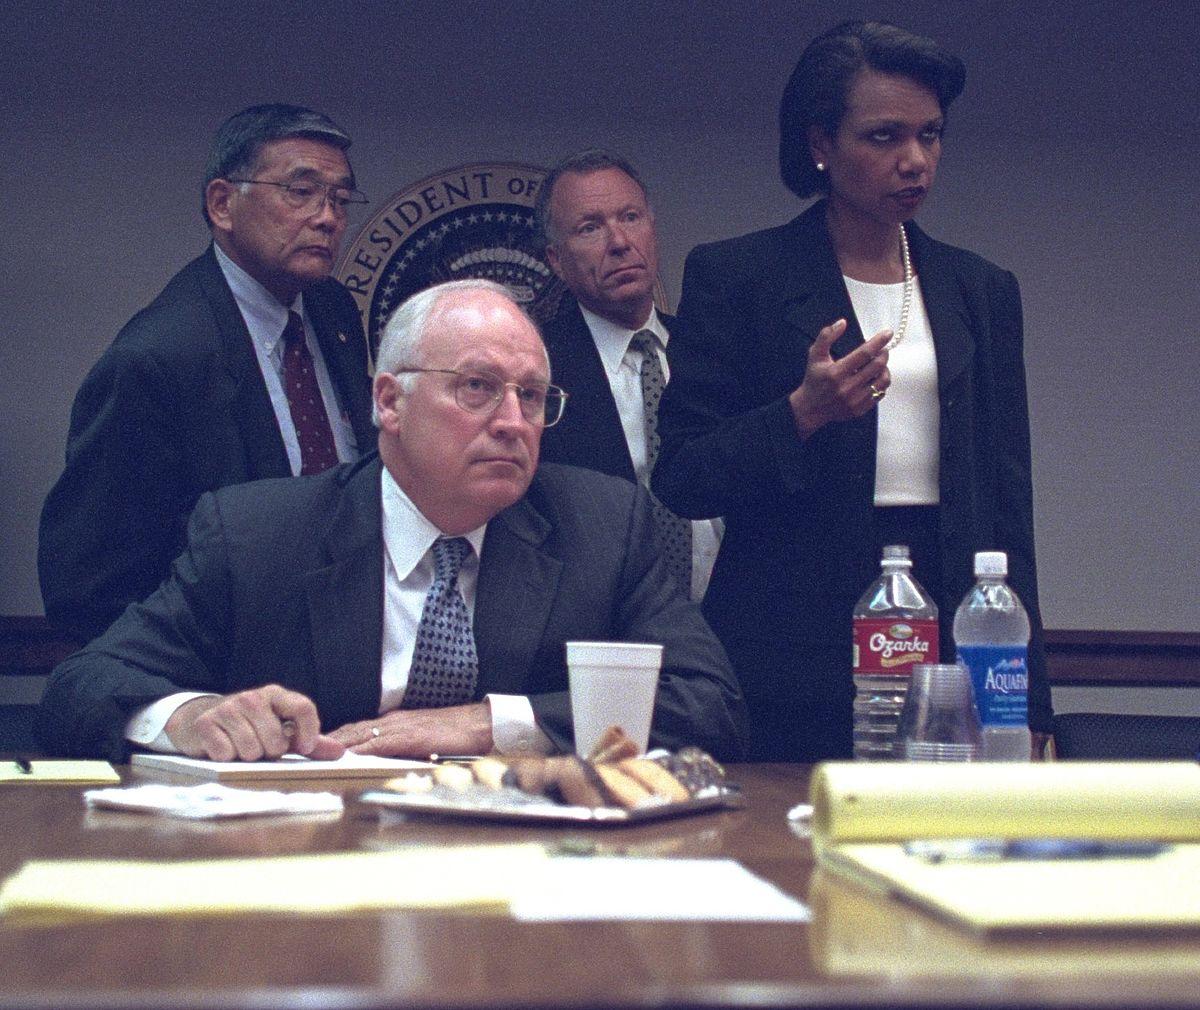 Cheney Senior Staff 9-11 PEOC Cropped.jpg